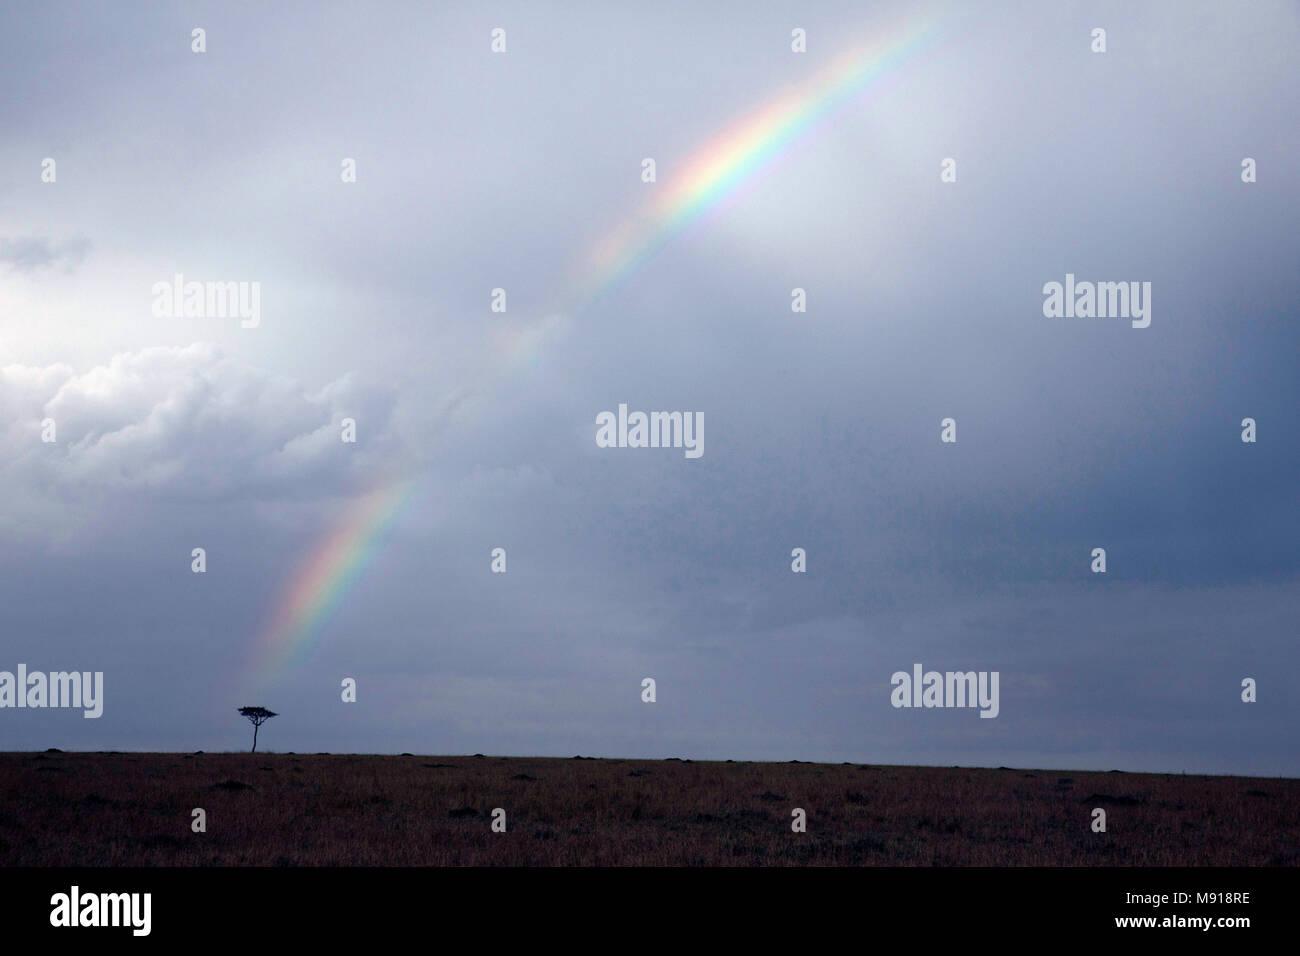 Rainbow over acacia tree on savanna. Masai Mara game reserve. Kenya. - Stock Image